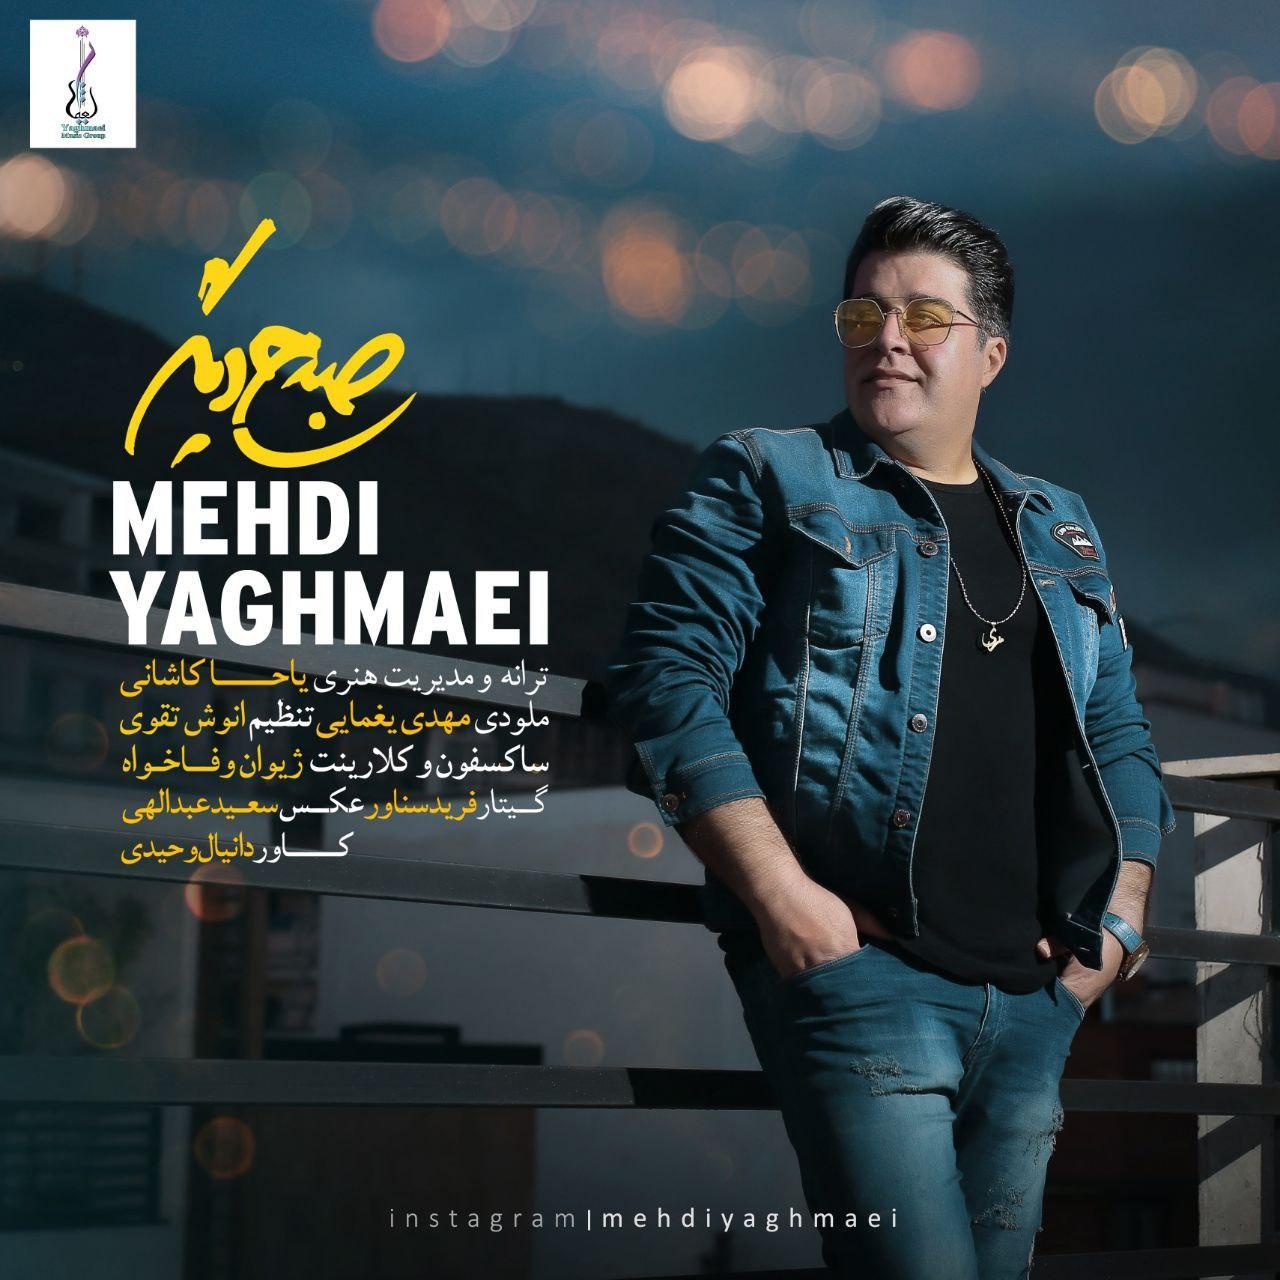 Mehdi Yaghmaei - Sobhi Digar - دانلود آهنگ مهدی یغمایی به نام صبحی دیگر